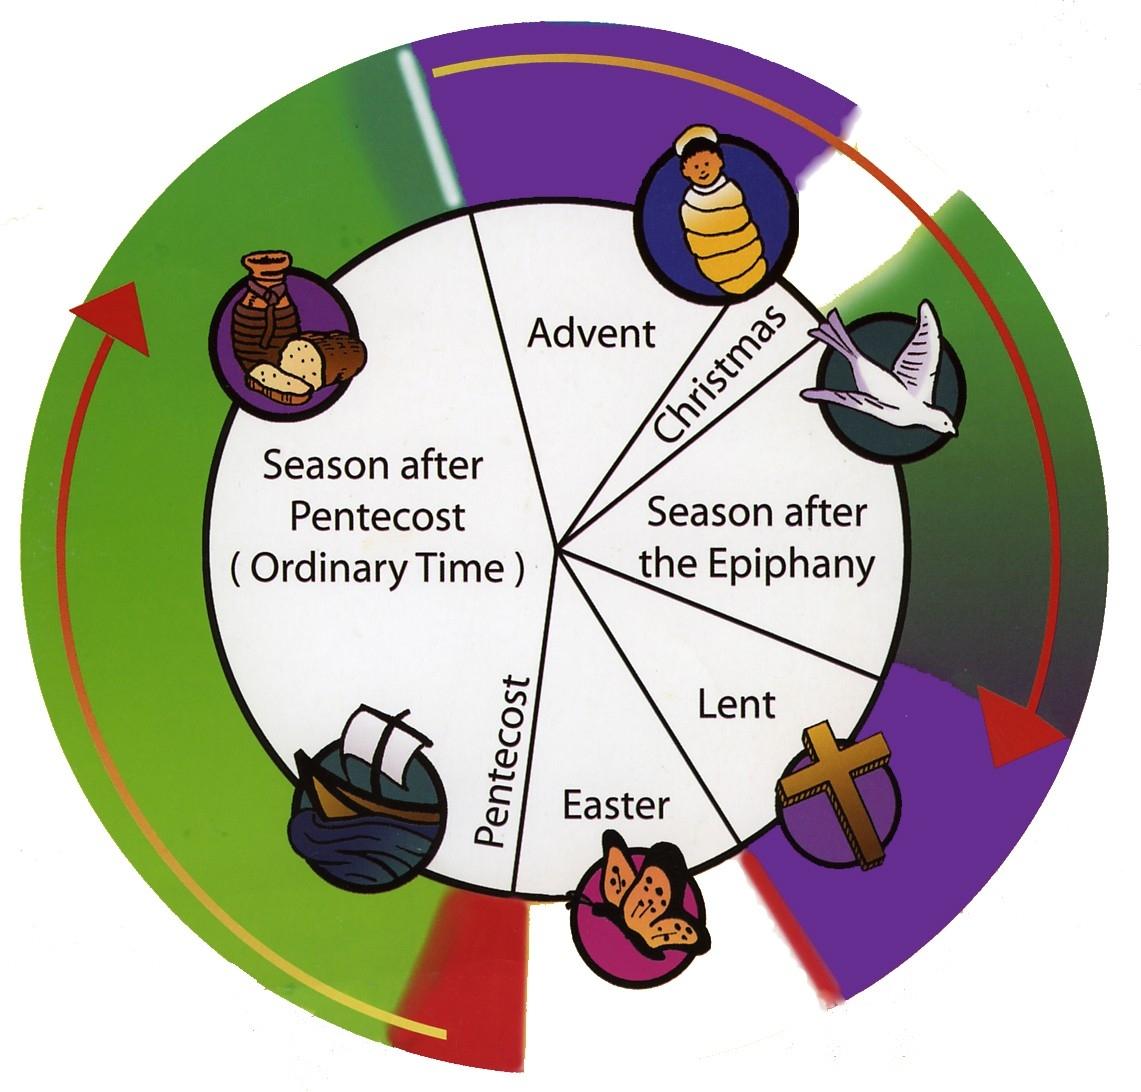 Methodist Liturgical Calendar - Template Calendar Design